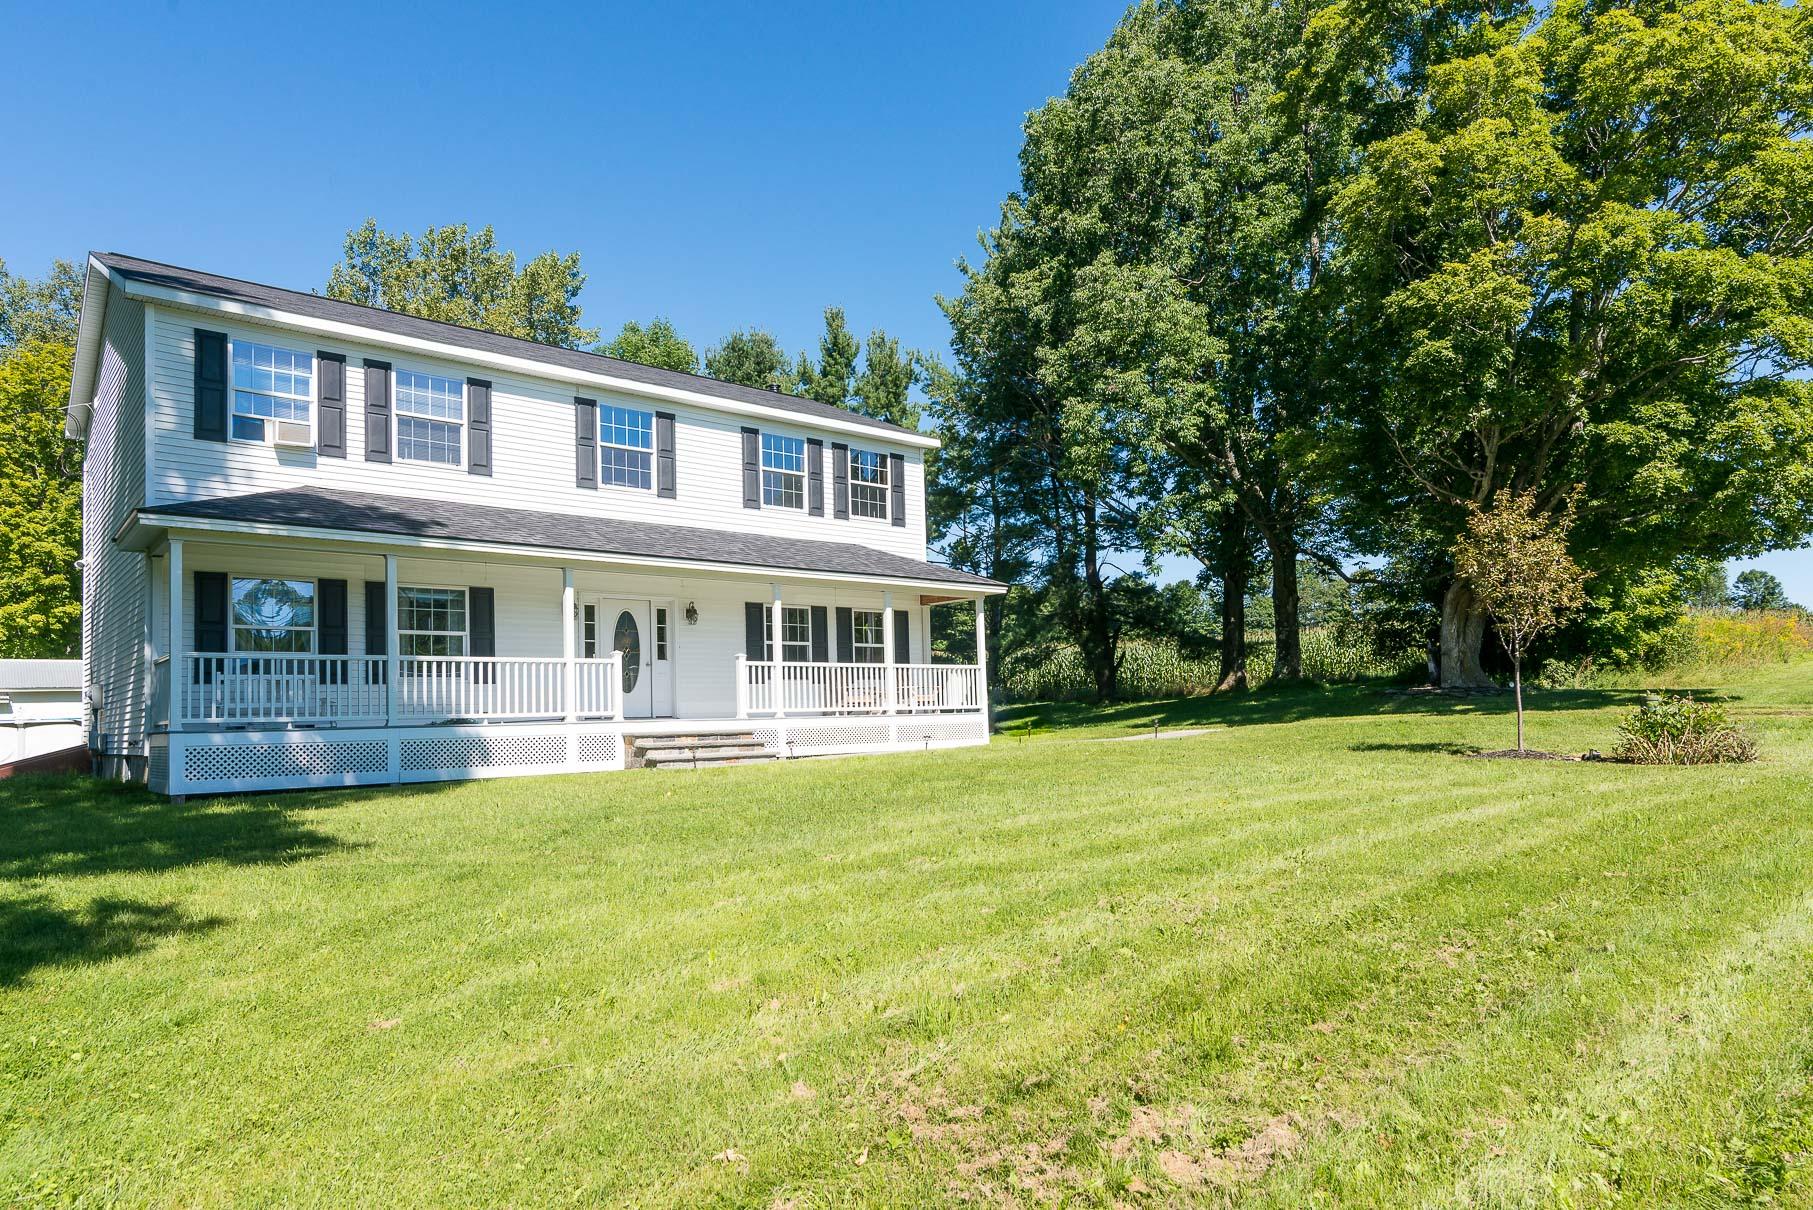 独户住宅 为 销售 在 Newer Colonial in Quintessential Country Location 3869 Brook Rd 丹比, 佛蒙特州 05739 美国